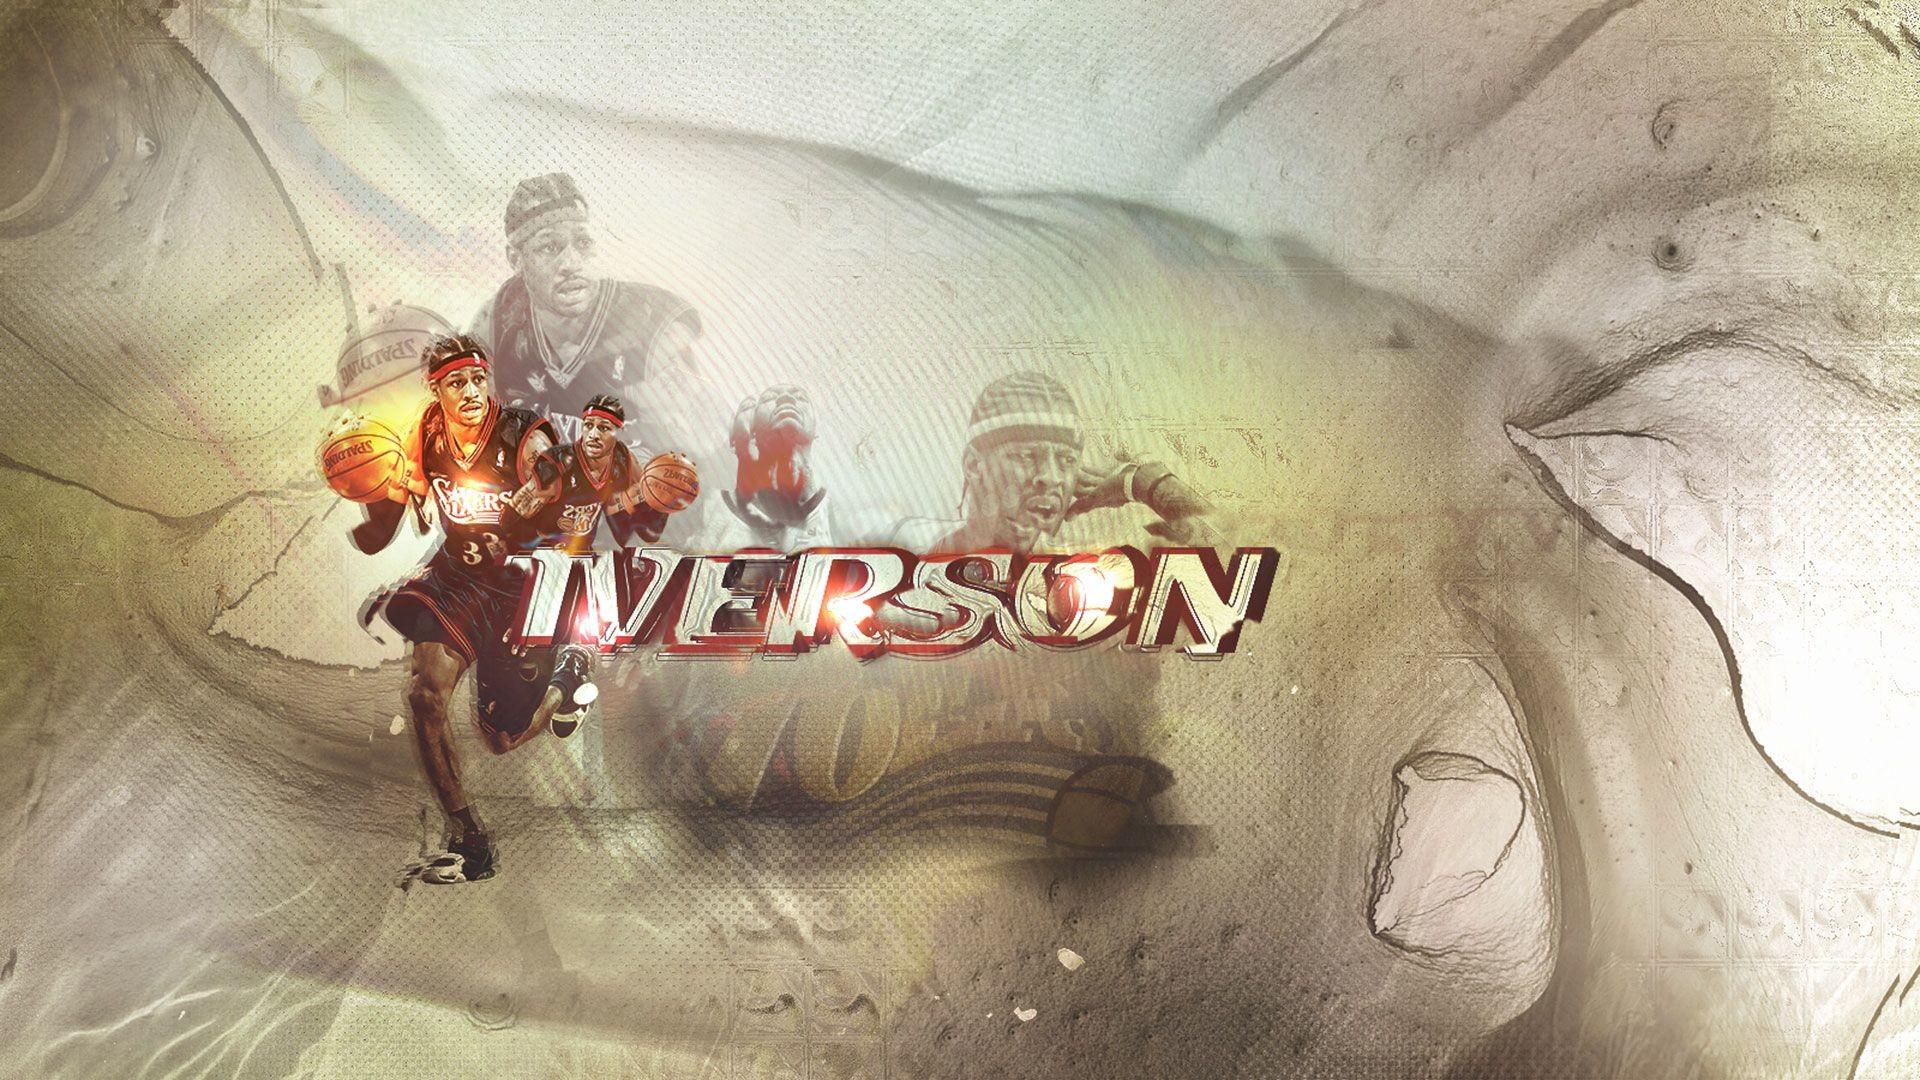 Allen Iverson 1080p Wallpaper https://wallpapers-and-backgrounds.net/